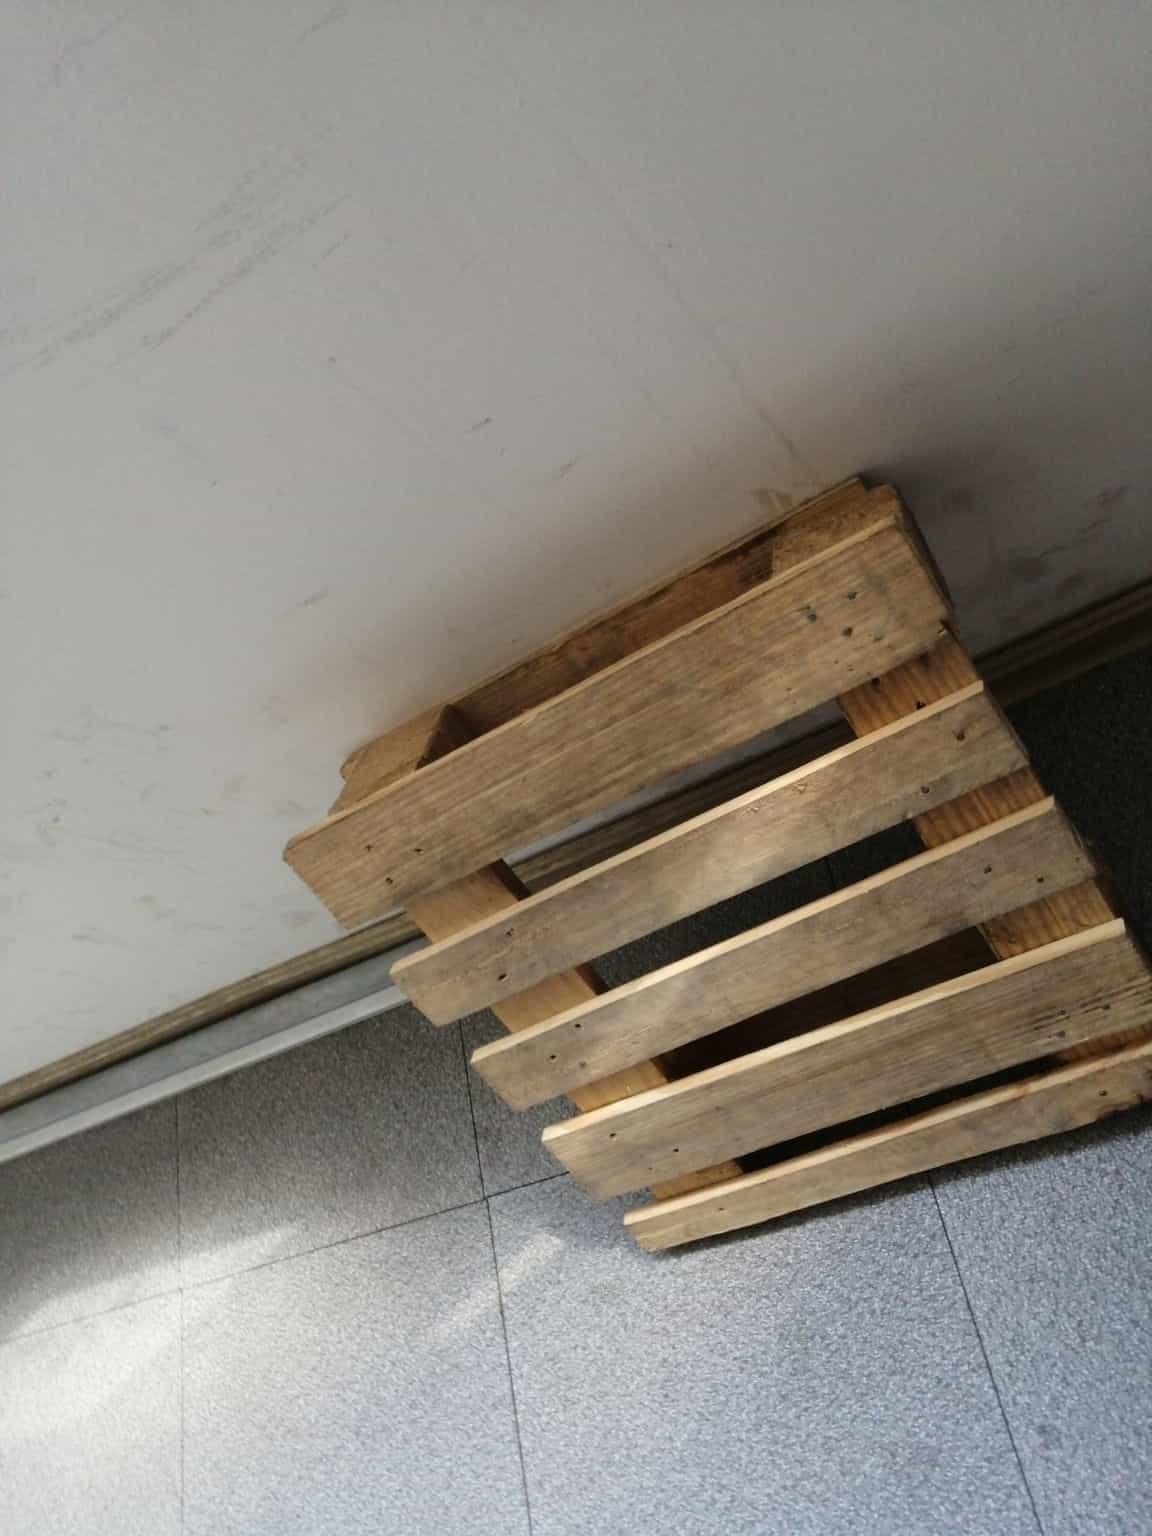 大??,╭ヌ木托盘?,╝㋈だ▣ㇾ?质供货_商品批发价??,☎✎♦≇